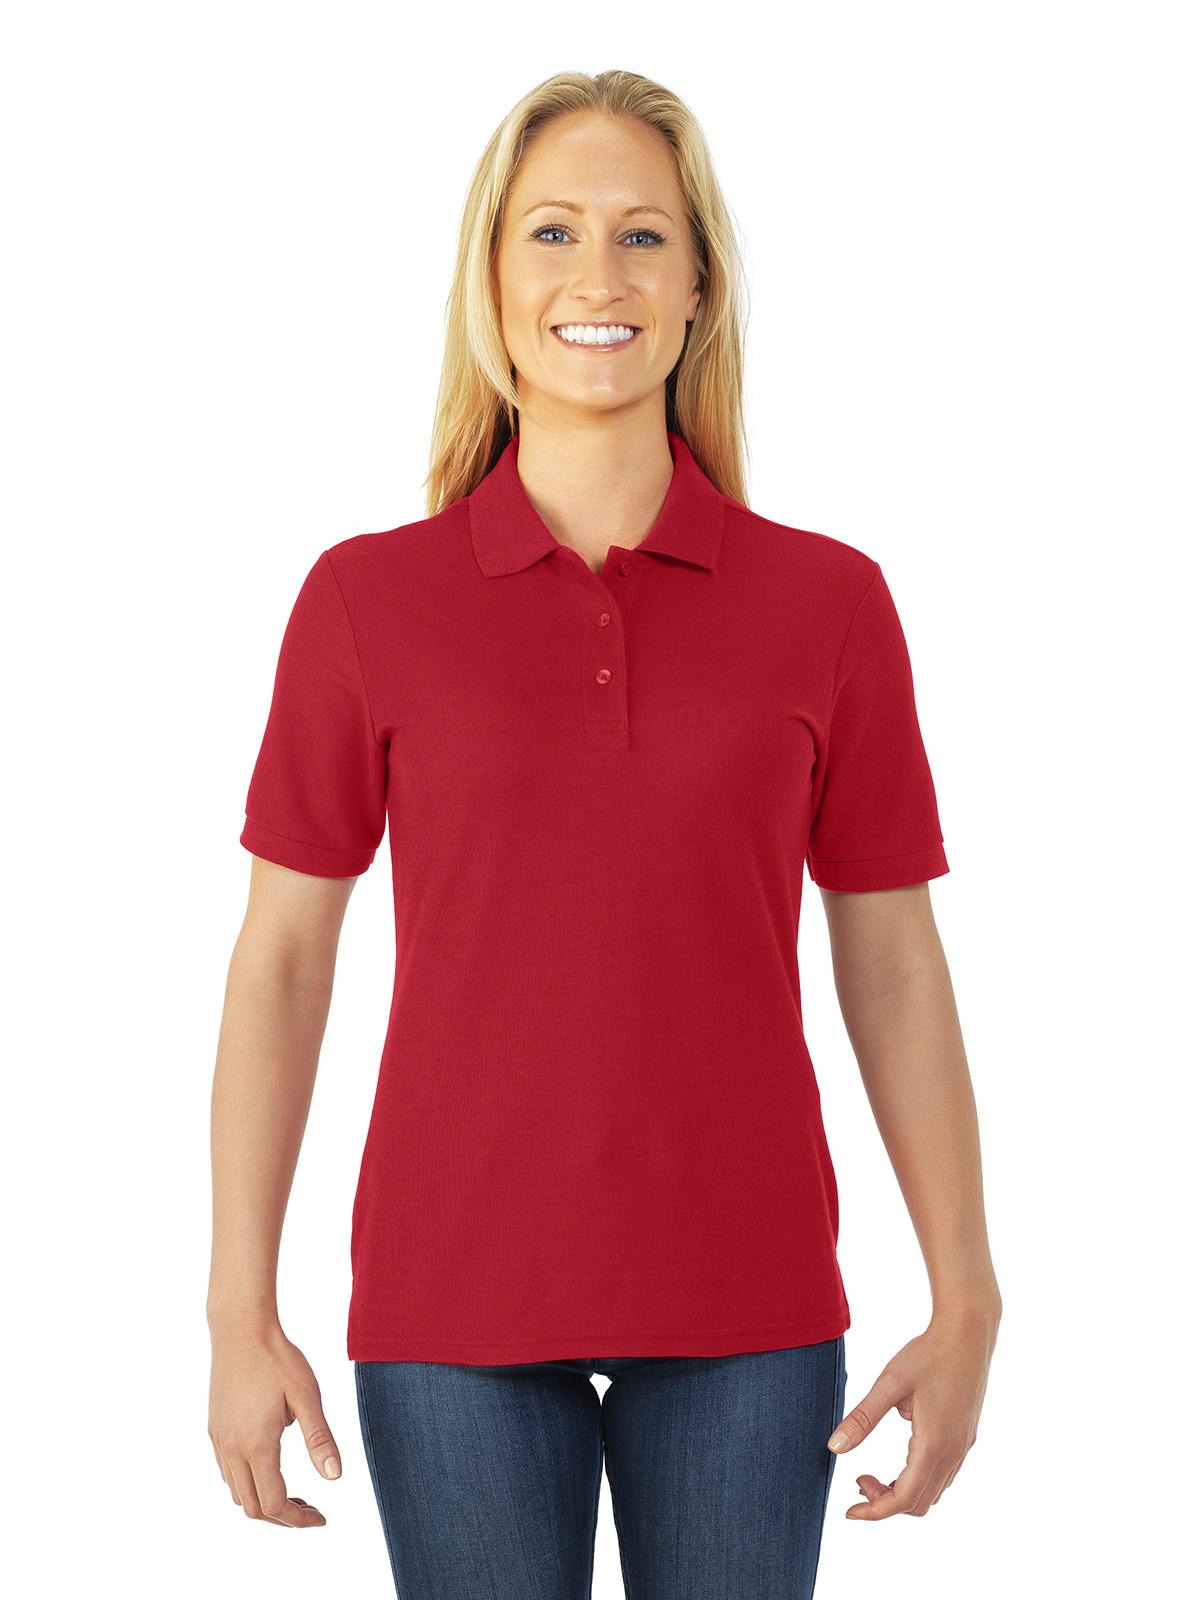 JERZEES Easy Care Ladies  Sport Shirt - Charitees - Custom Apparel + ... e7cd0b8023beb